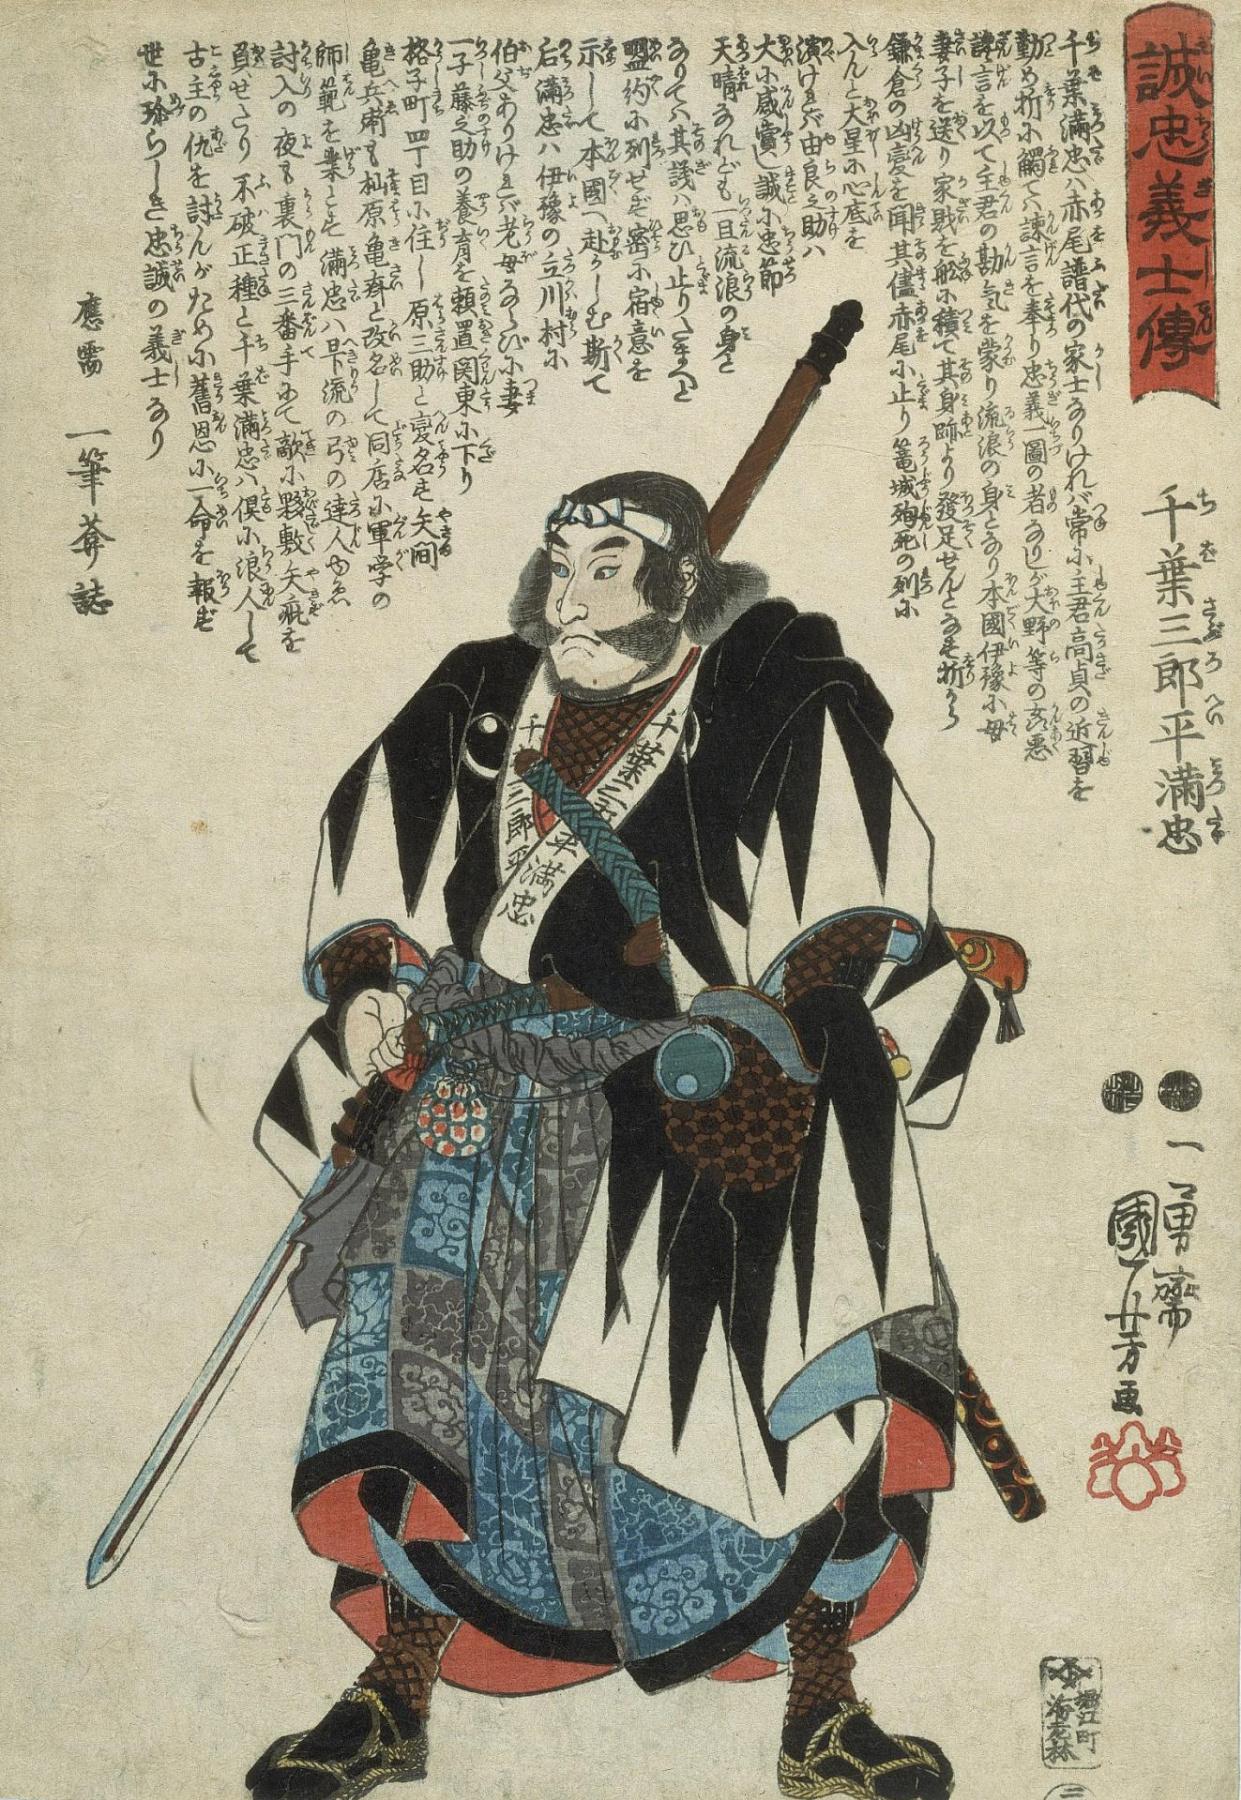 Utagawa Kuniyoshi. 47 loyal samurai. Chiba Sauraha Mizutama is holding a helmet with a hood and spear